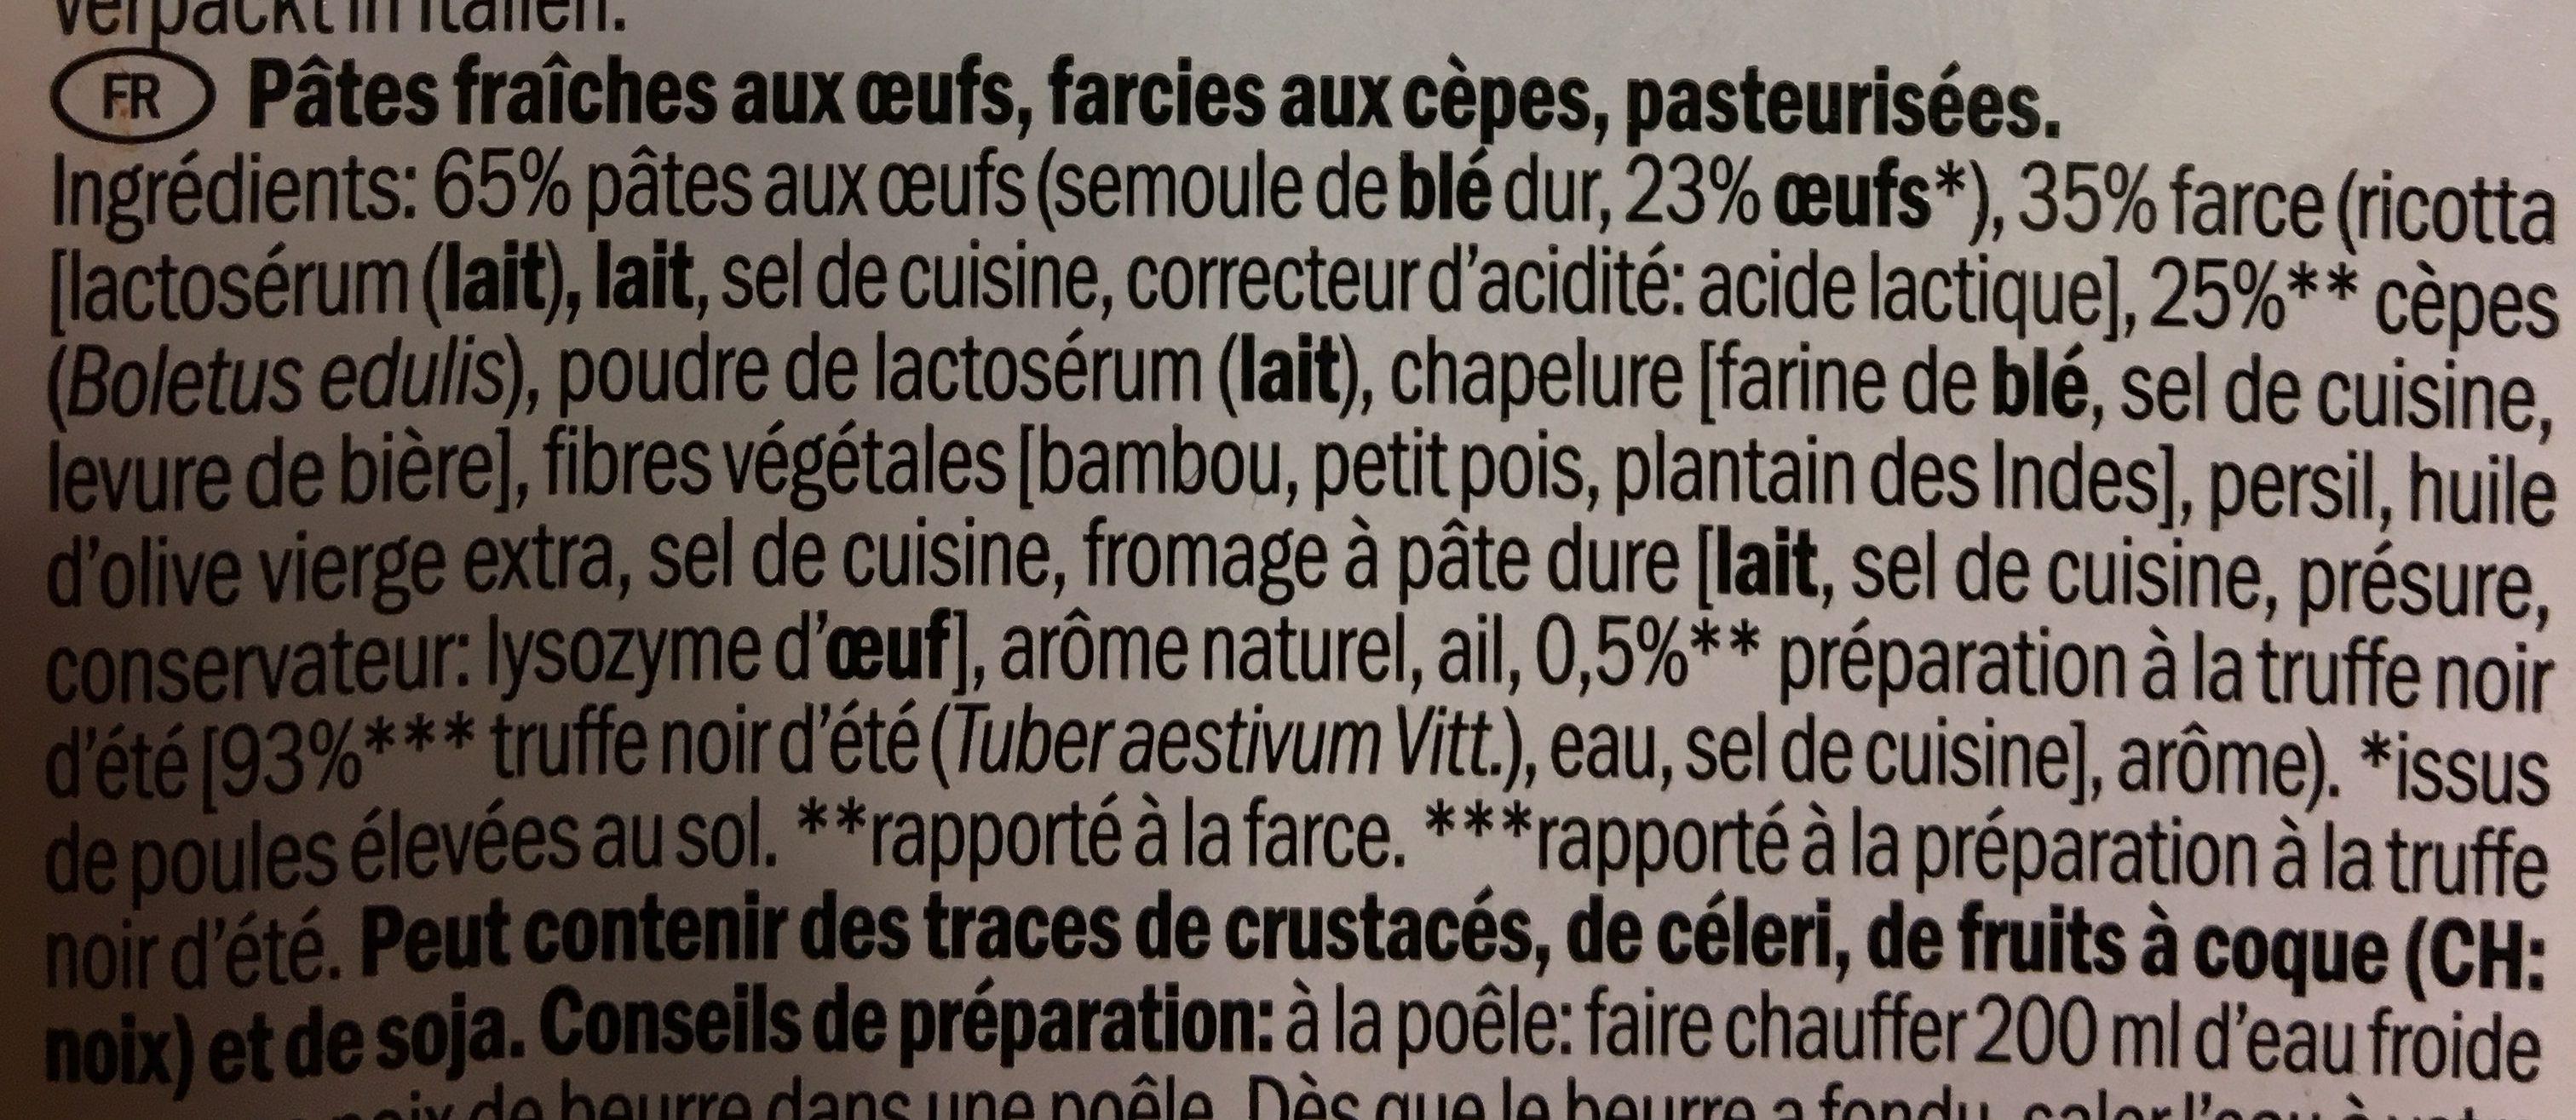 Pappardelle ripiene - Ingrédients - fr